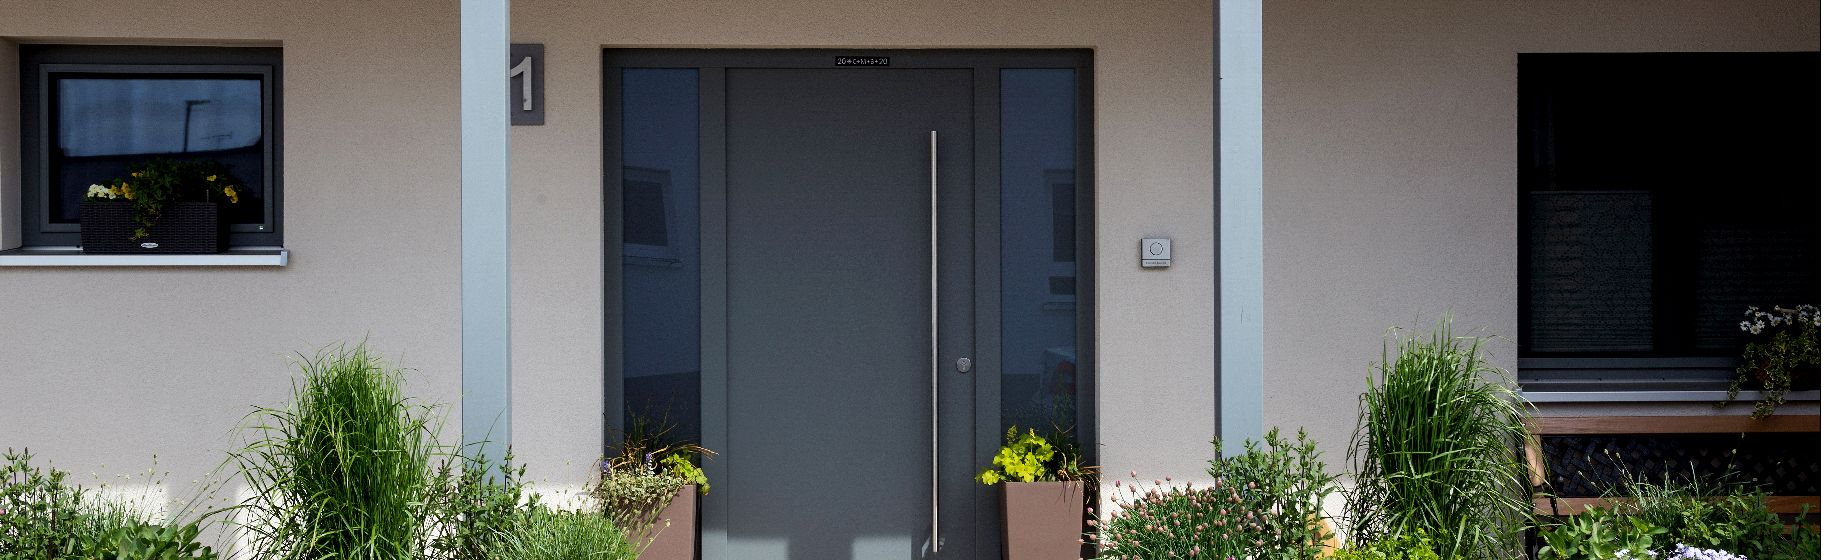 Fenster, Haustüren & Sonnenschutz